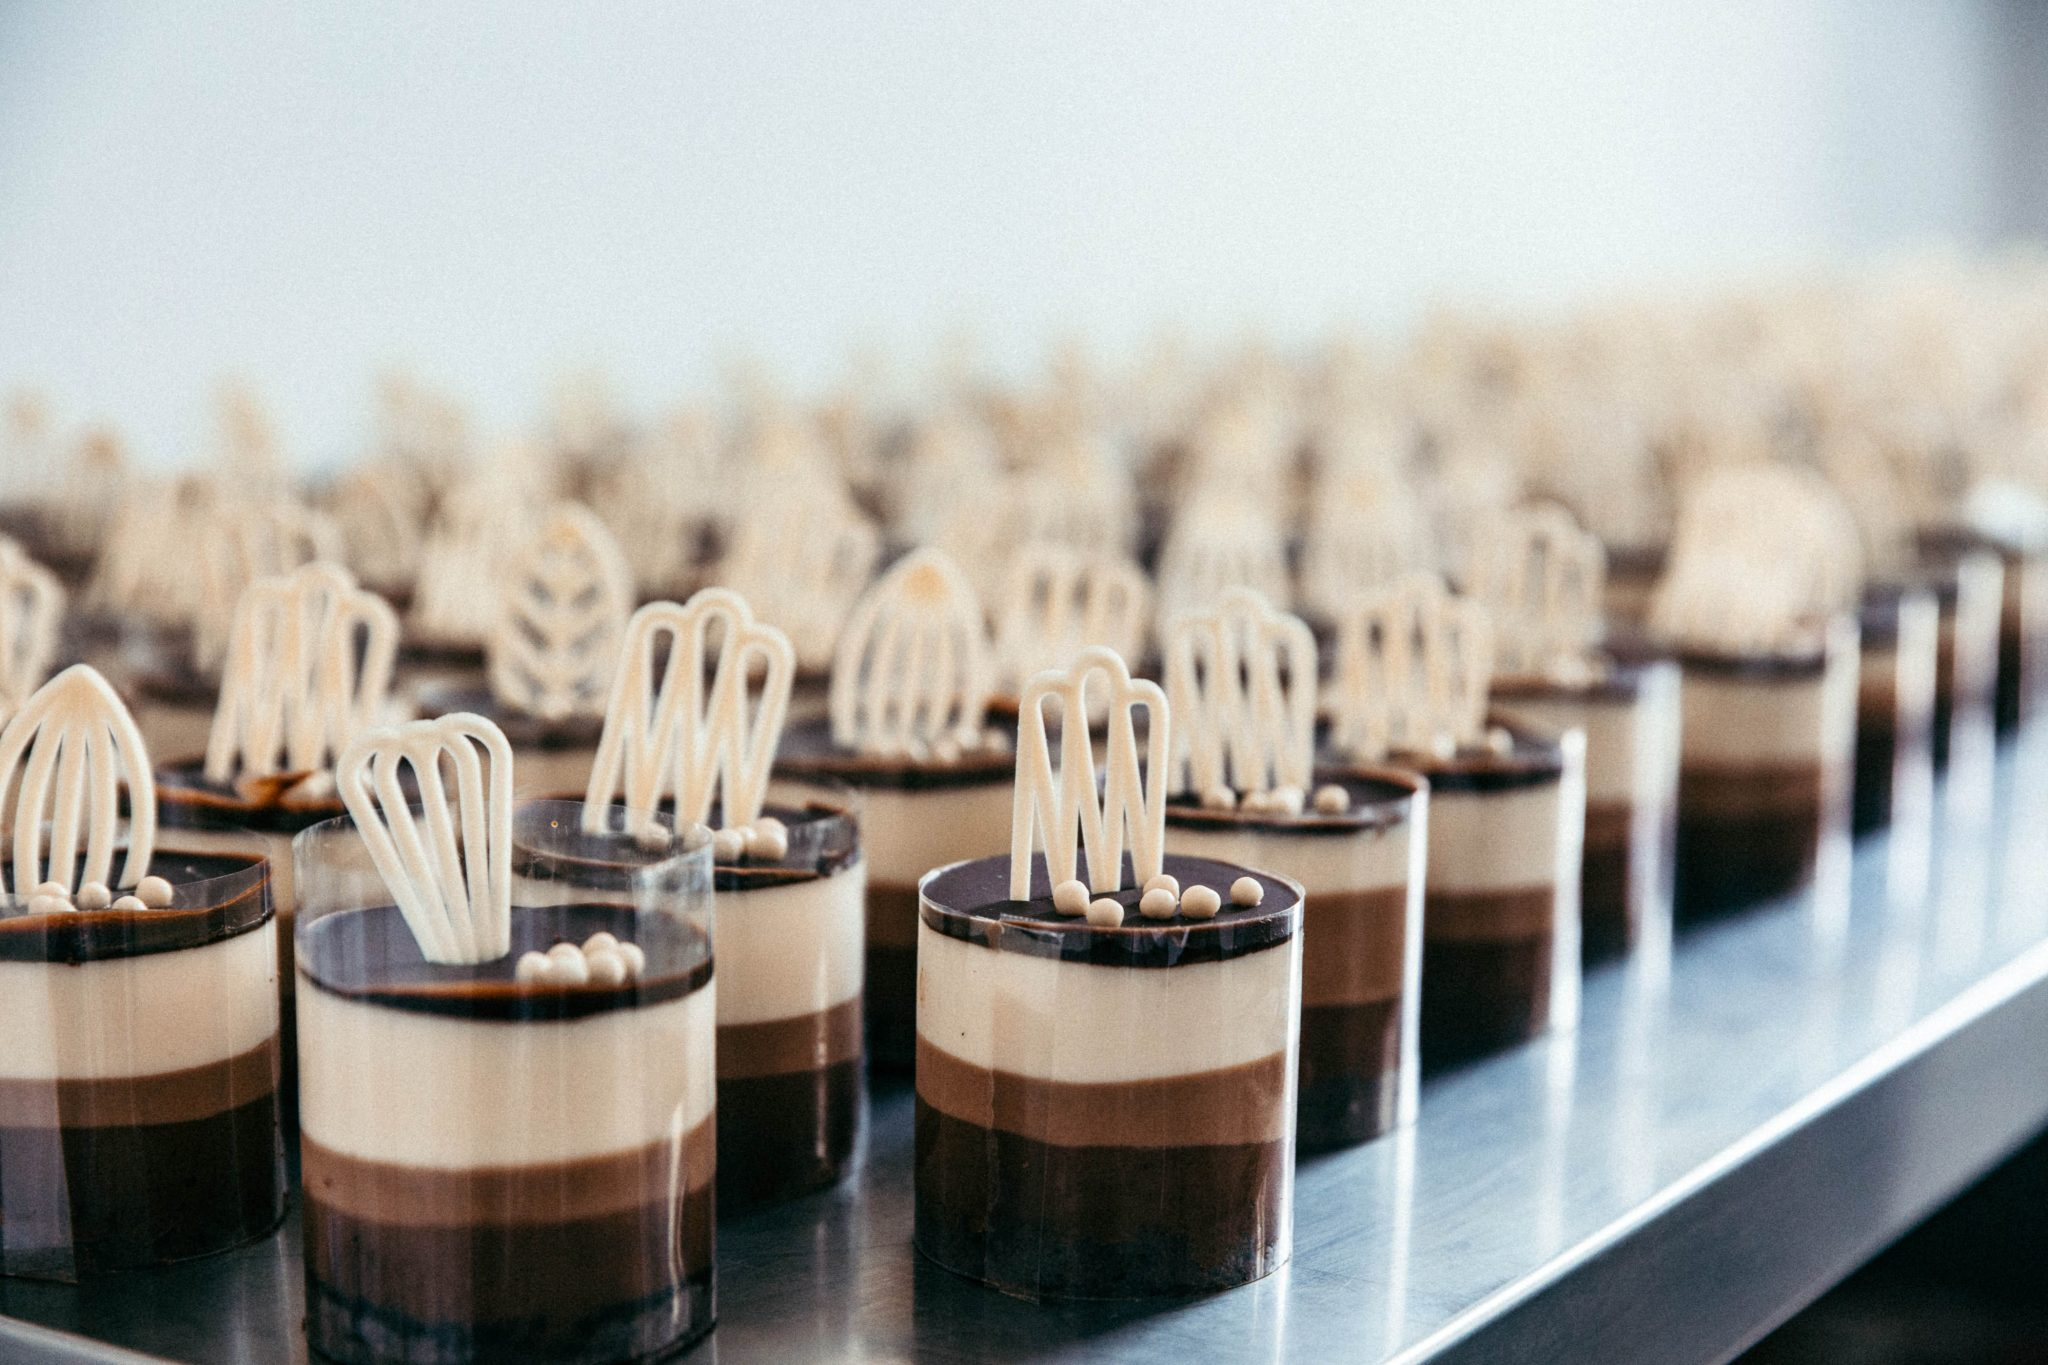 fotografie-comerciala-pentru-firme-barbaras-cakes-cofetarie-targu-mures-foto-majos-daniel-1